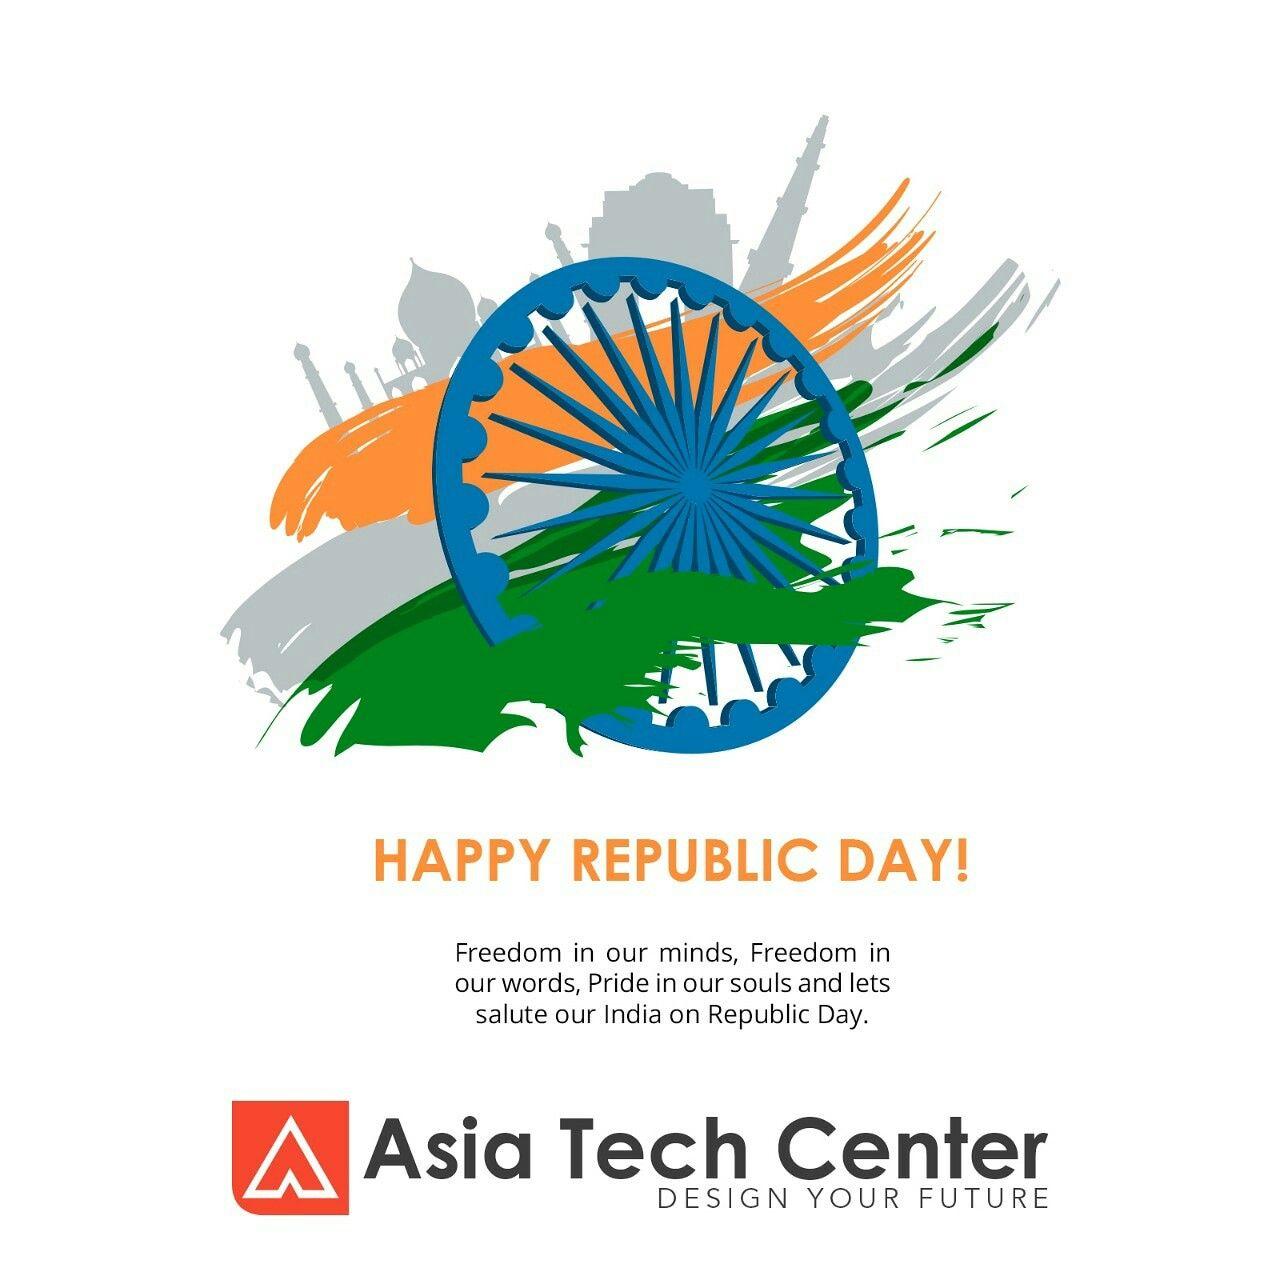 Happy Republic Day 2021 In 2021 Republic Day Day Wishes Republic